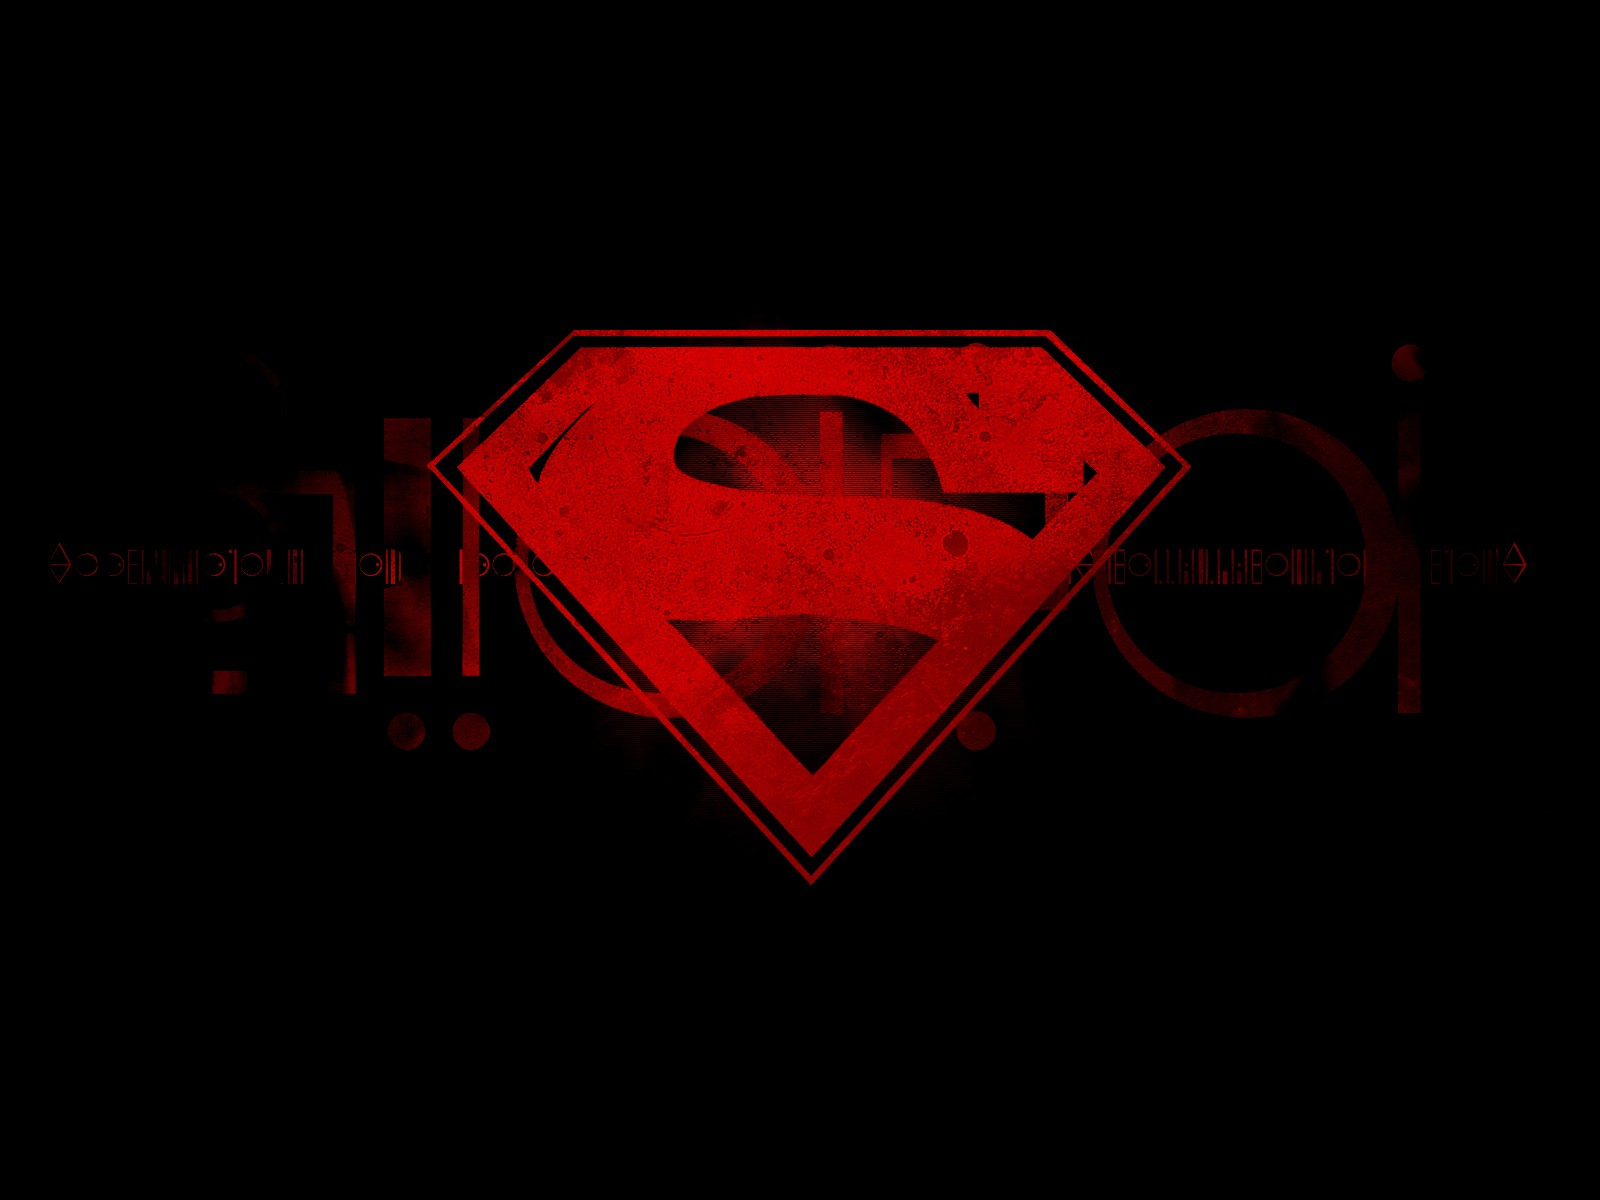 Comics superman logo black background abstract Logo 1600x1200